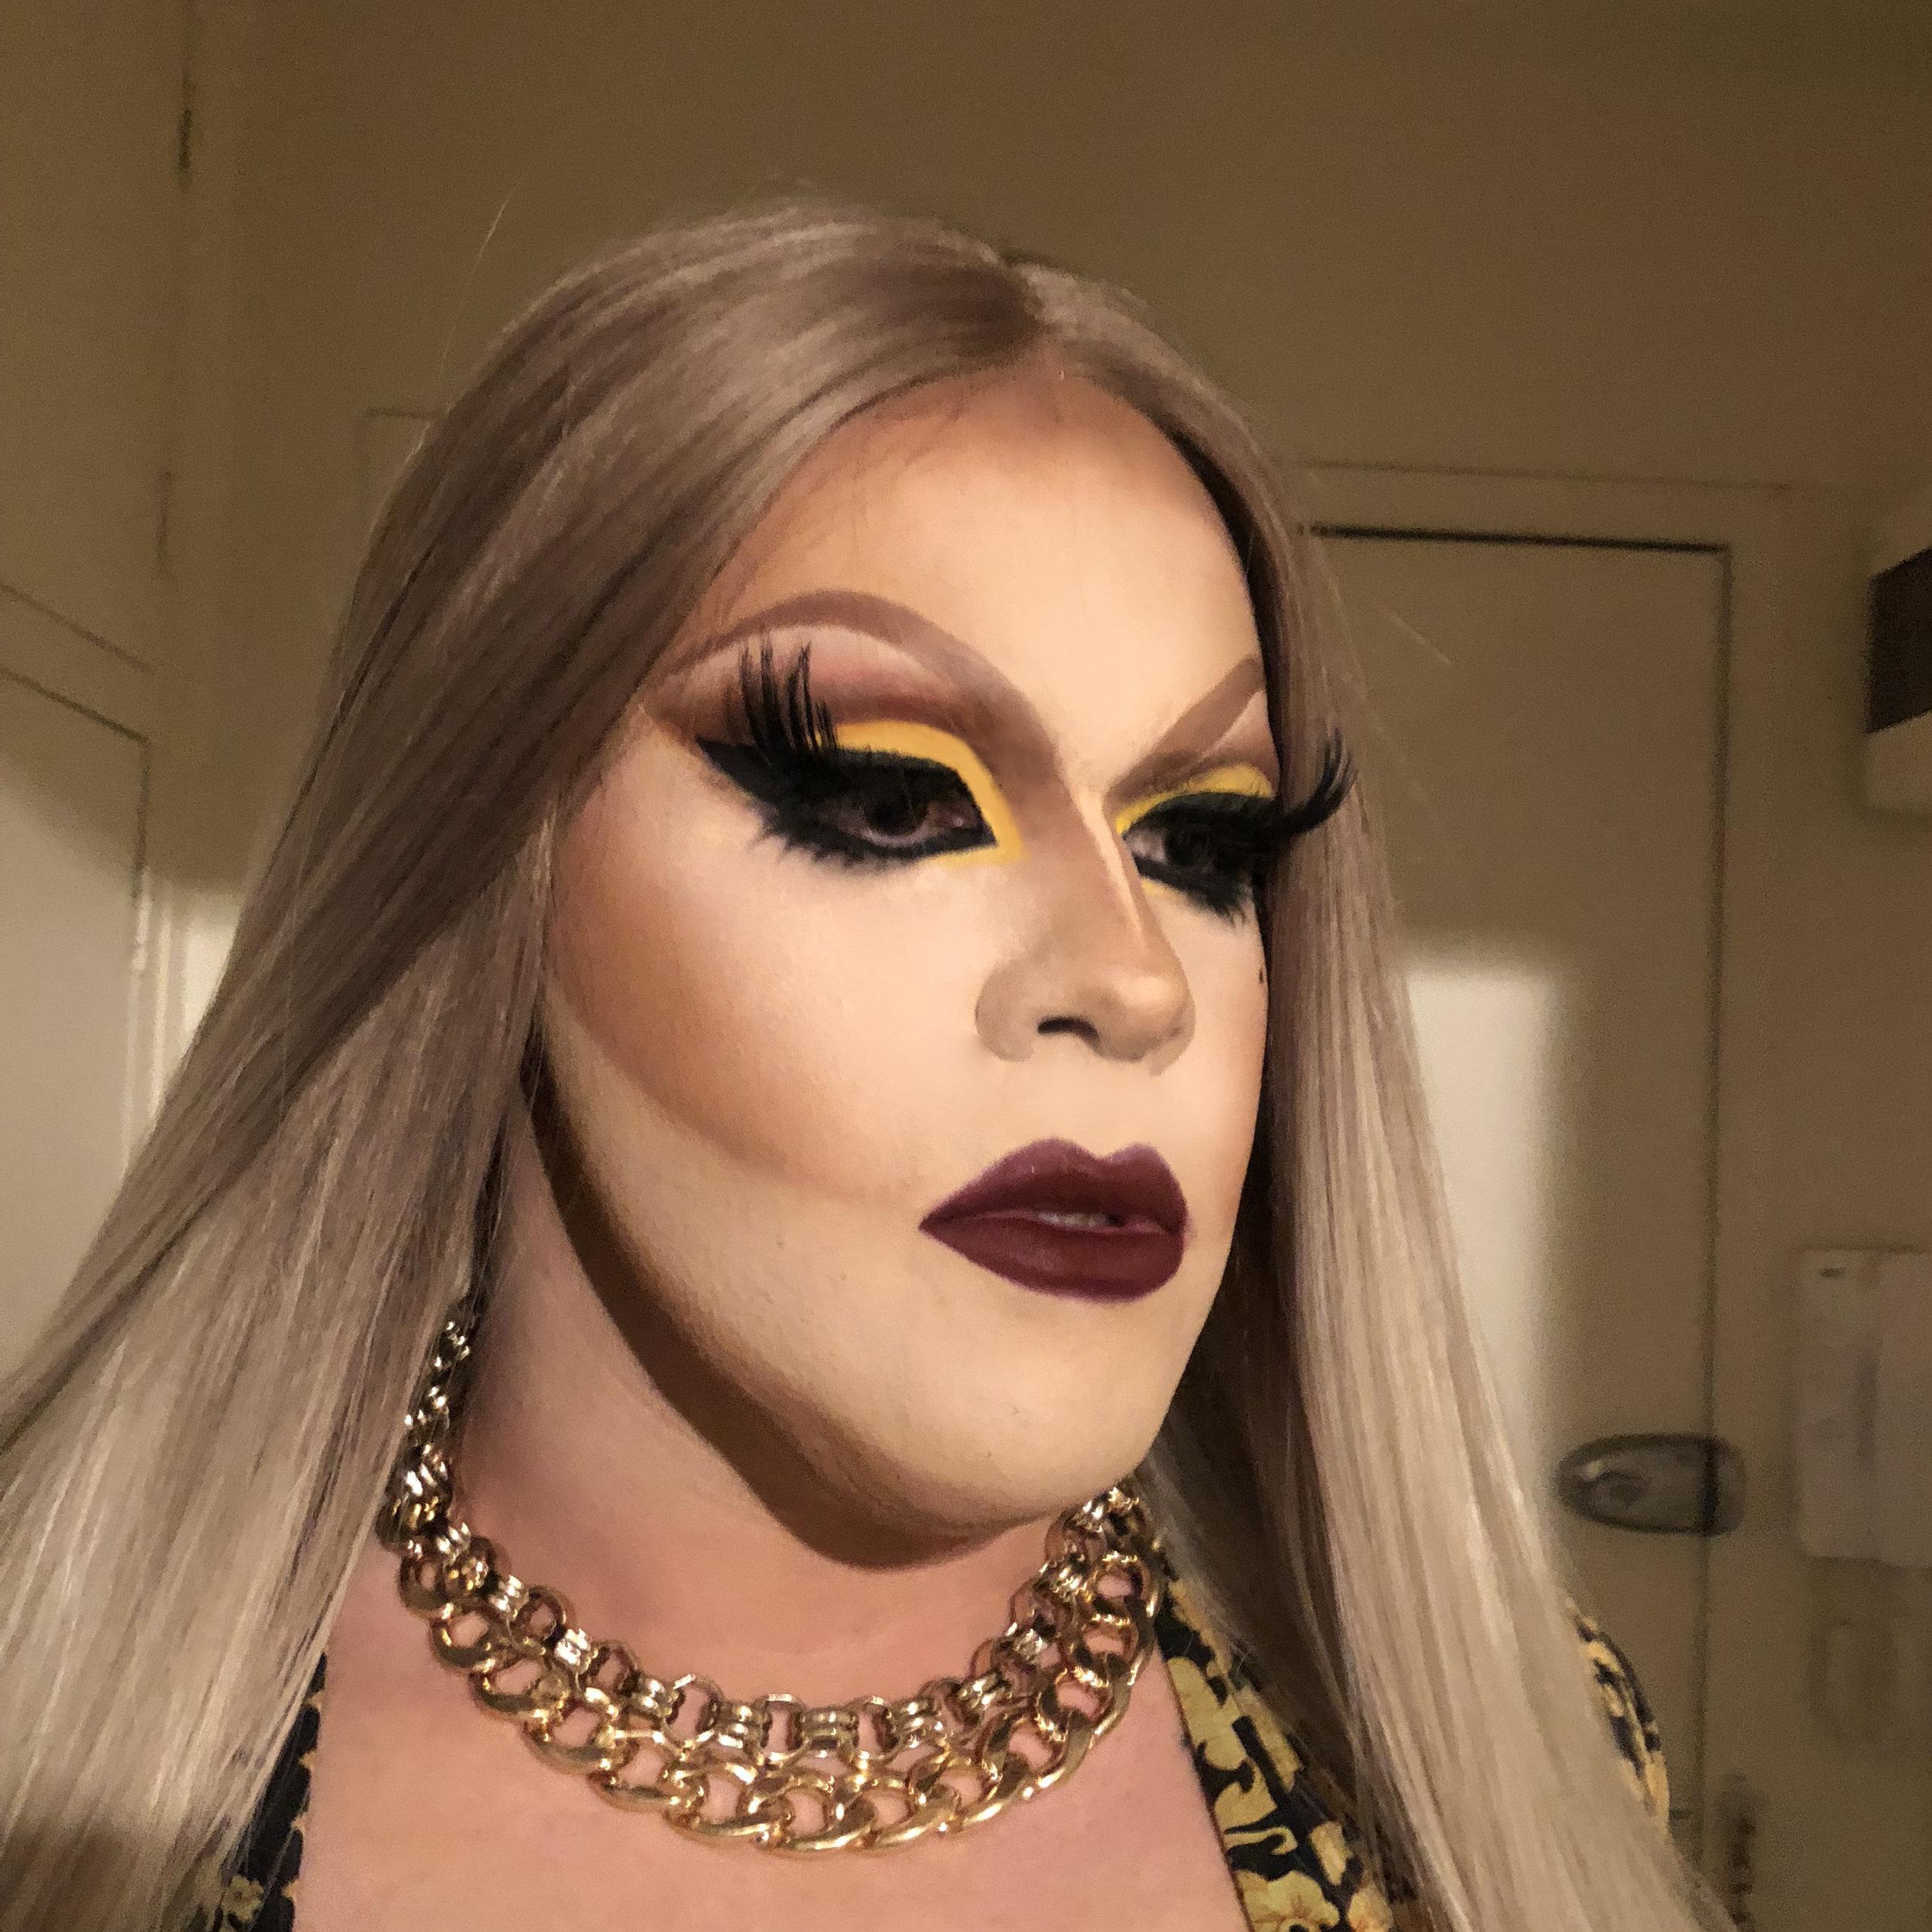 Art_Simone_Melbourne_Drag_Queen_Hire_Appearance_Melbourne_Victoria_Australia_Melb_Makeover_Transformation_Priscilla_Queen_of_the_dessert_the_musical_Skull_workshop_Purple_Sugarskull_halloween_horror